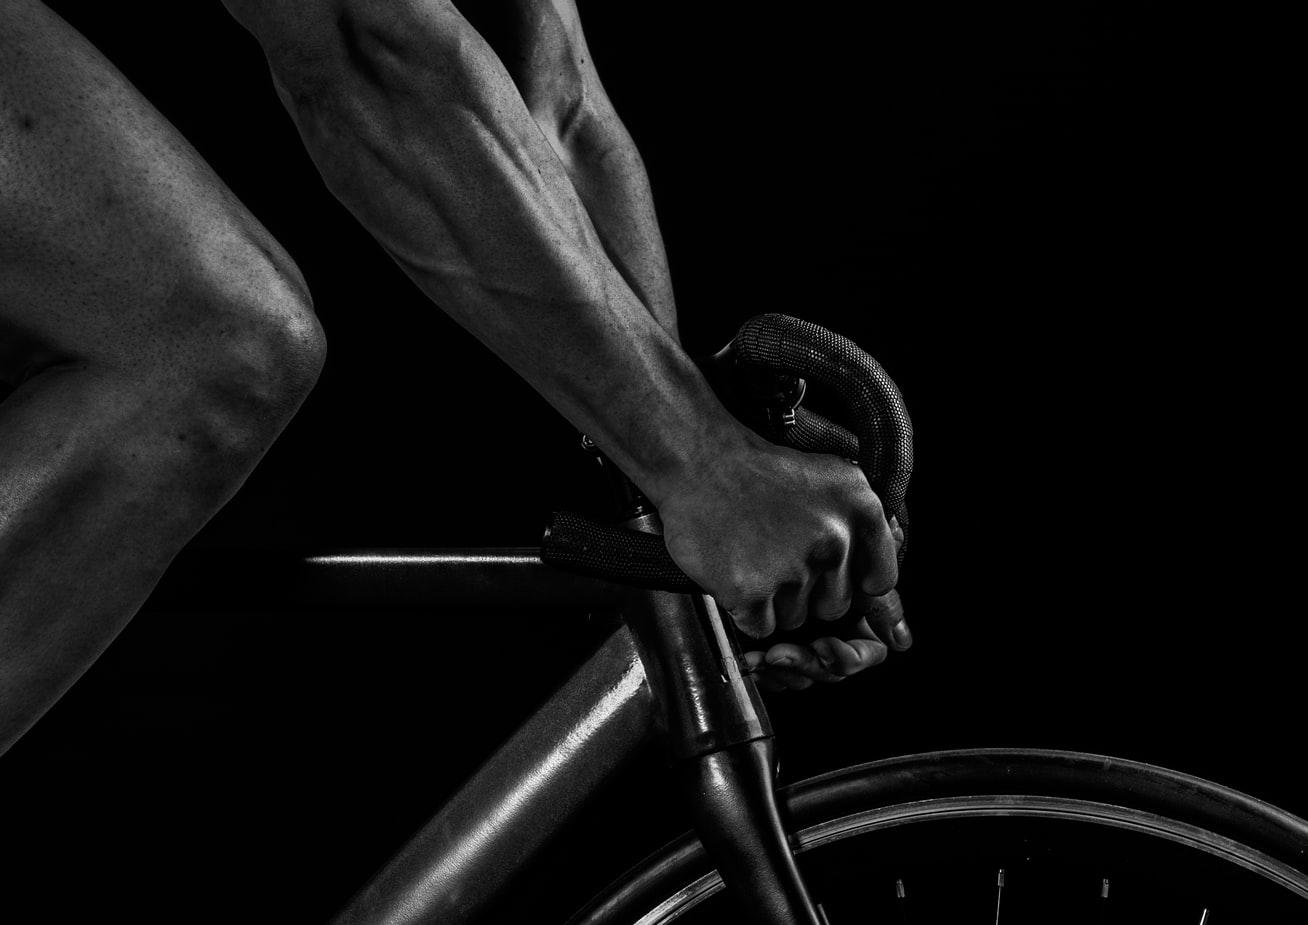 Man cycling on a bike.